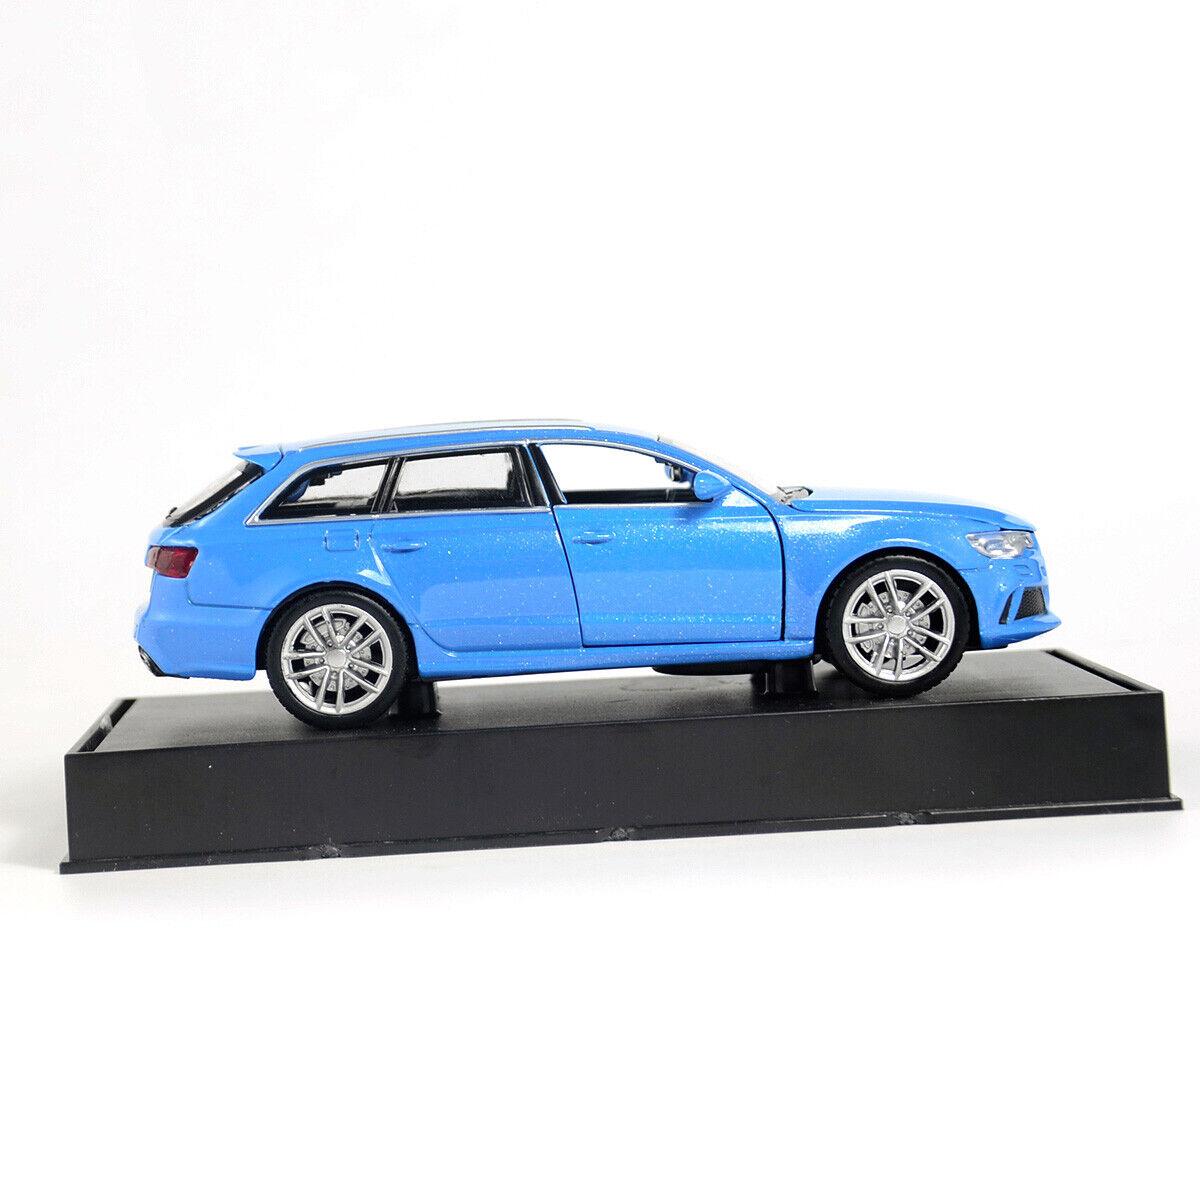 1 32 audi rs6 quattro metall die cast modellauto auto. Black Bedroom Furniture Sets. Home Design Ideas